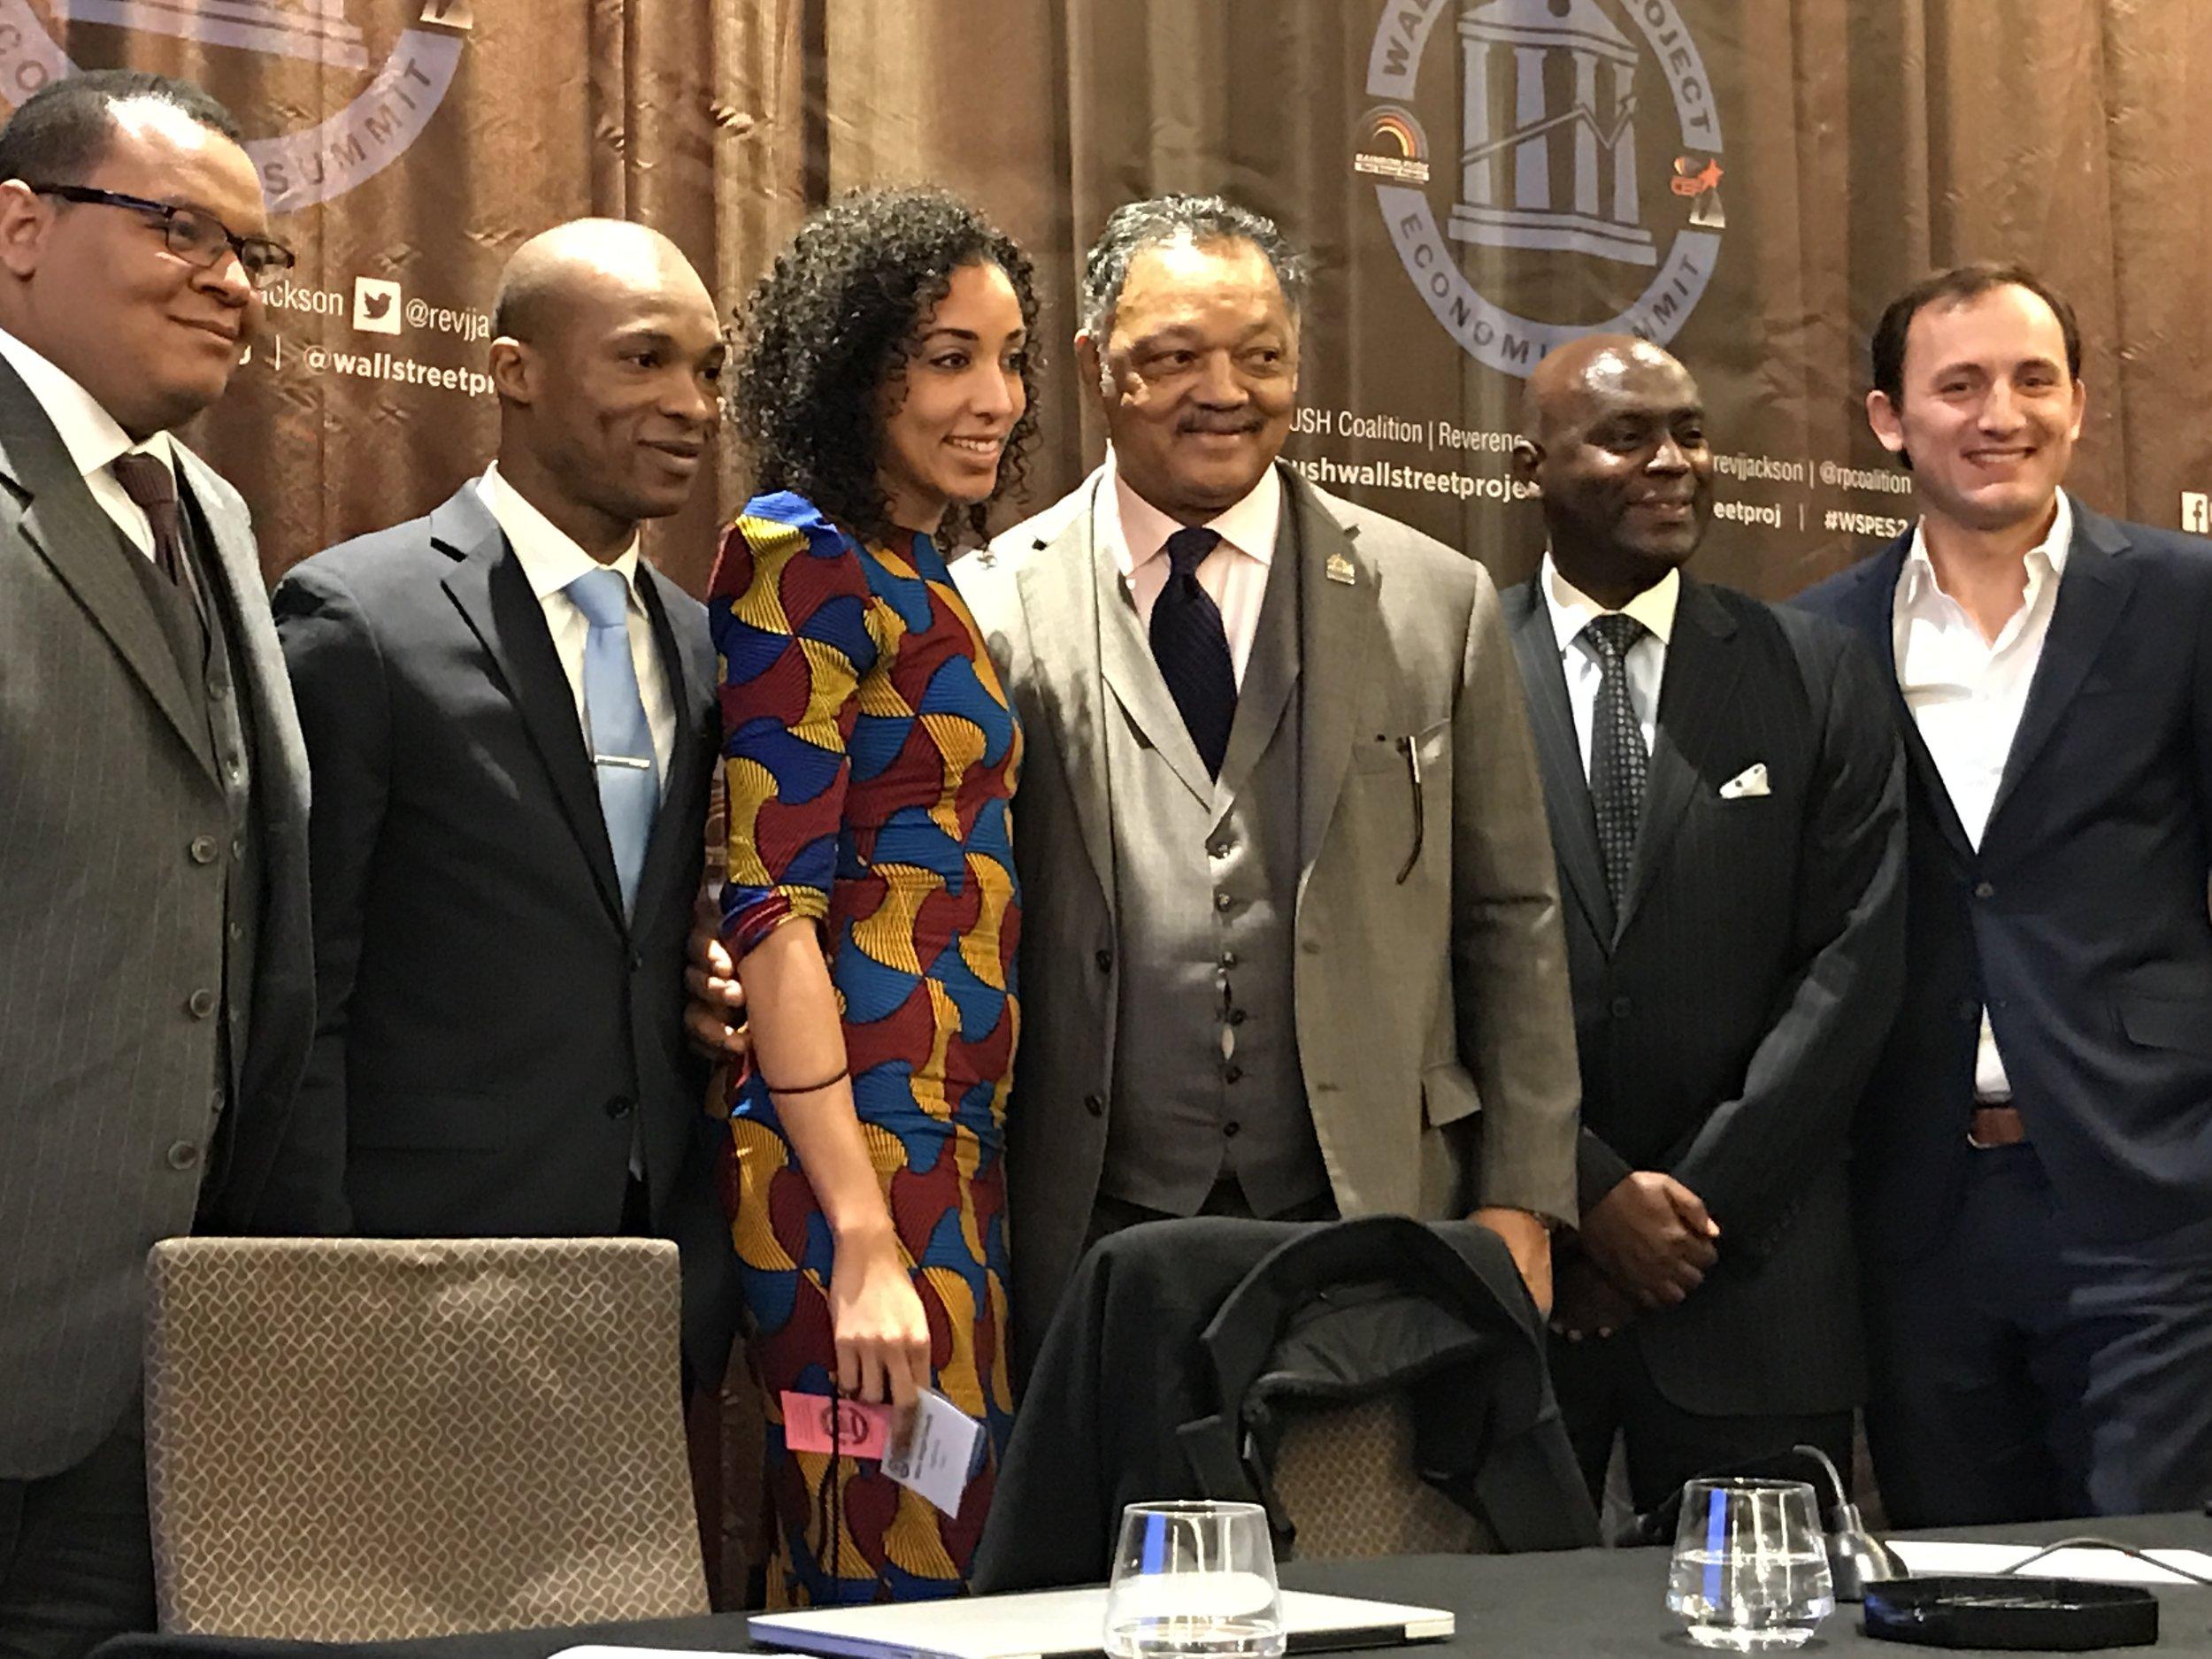 From the Left: Mr. Sulaiman Damazio, Director, Diasporah Development – Brazil || Mr. Serge L. Vallet, CEO, EnovativeTV || Mrs. Maya H. Famodu - Founder | Ecosystem Architect |Ingressive  || Reverend Jesse L Jackson, Sr., President & Founder, Rainbow PUSH Coalition ||Dr. Zweli Mkhize, Treasurer General, African National Congress - South Africa ||Mr.  Arben Kane , Managing Partner, Stacked Venture Builder & Dreamit Ventures